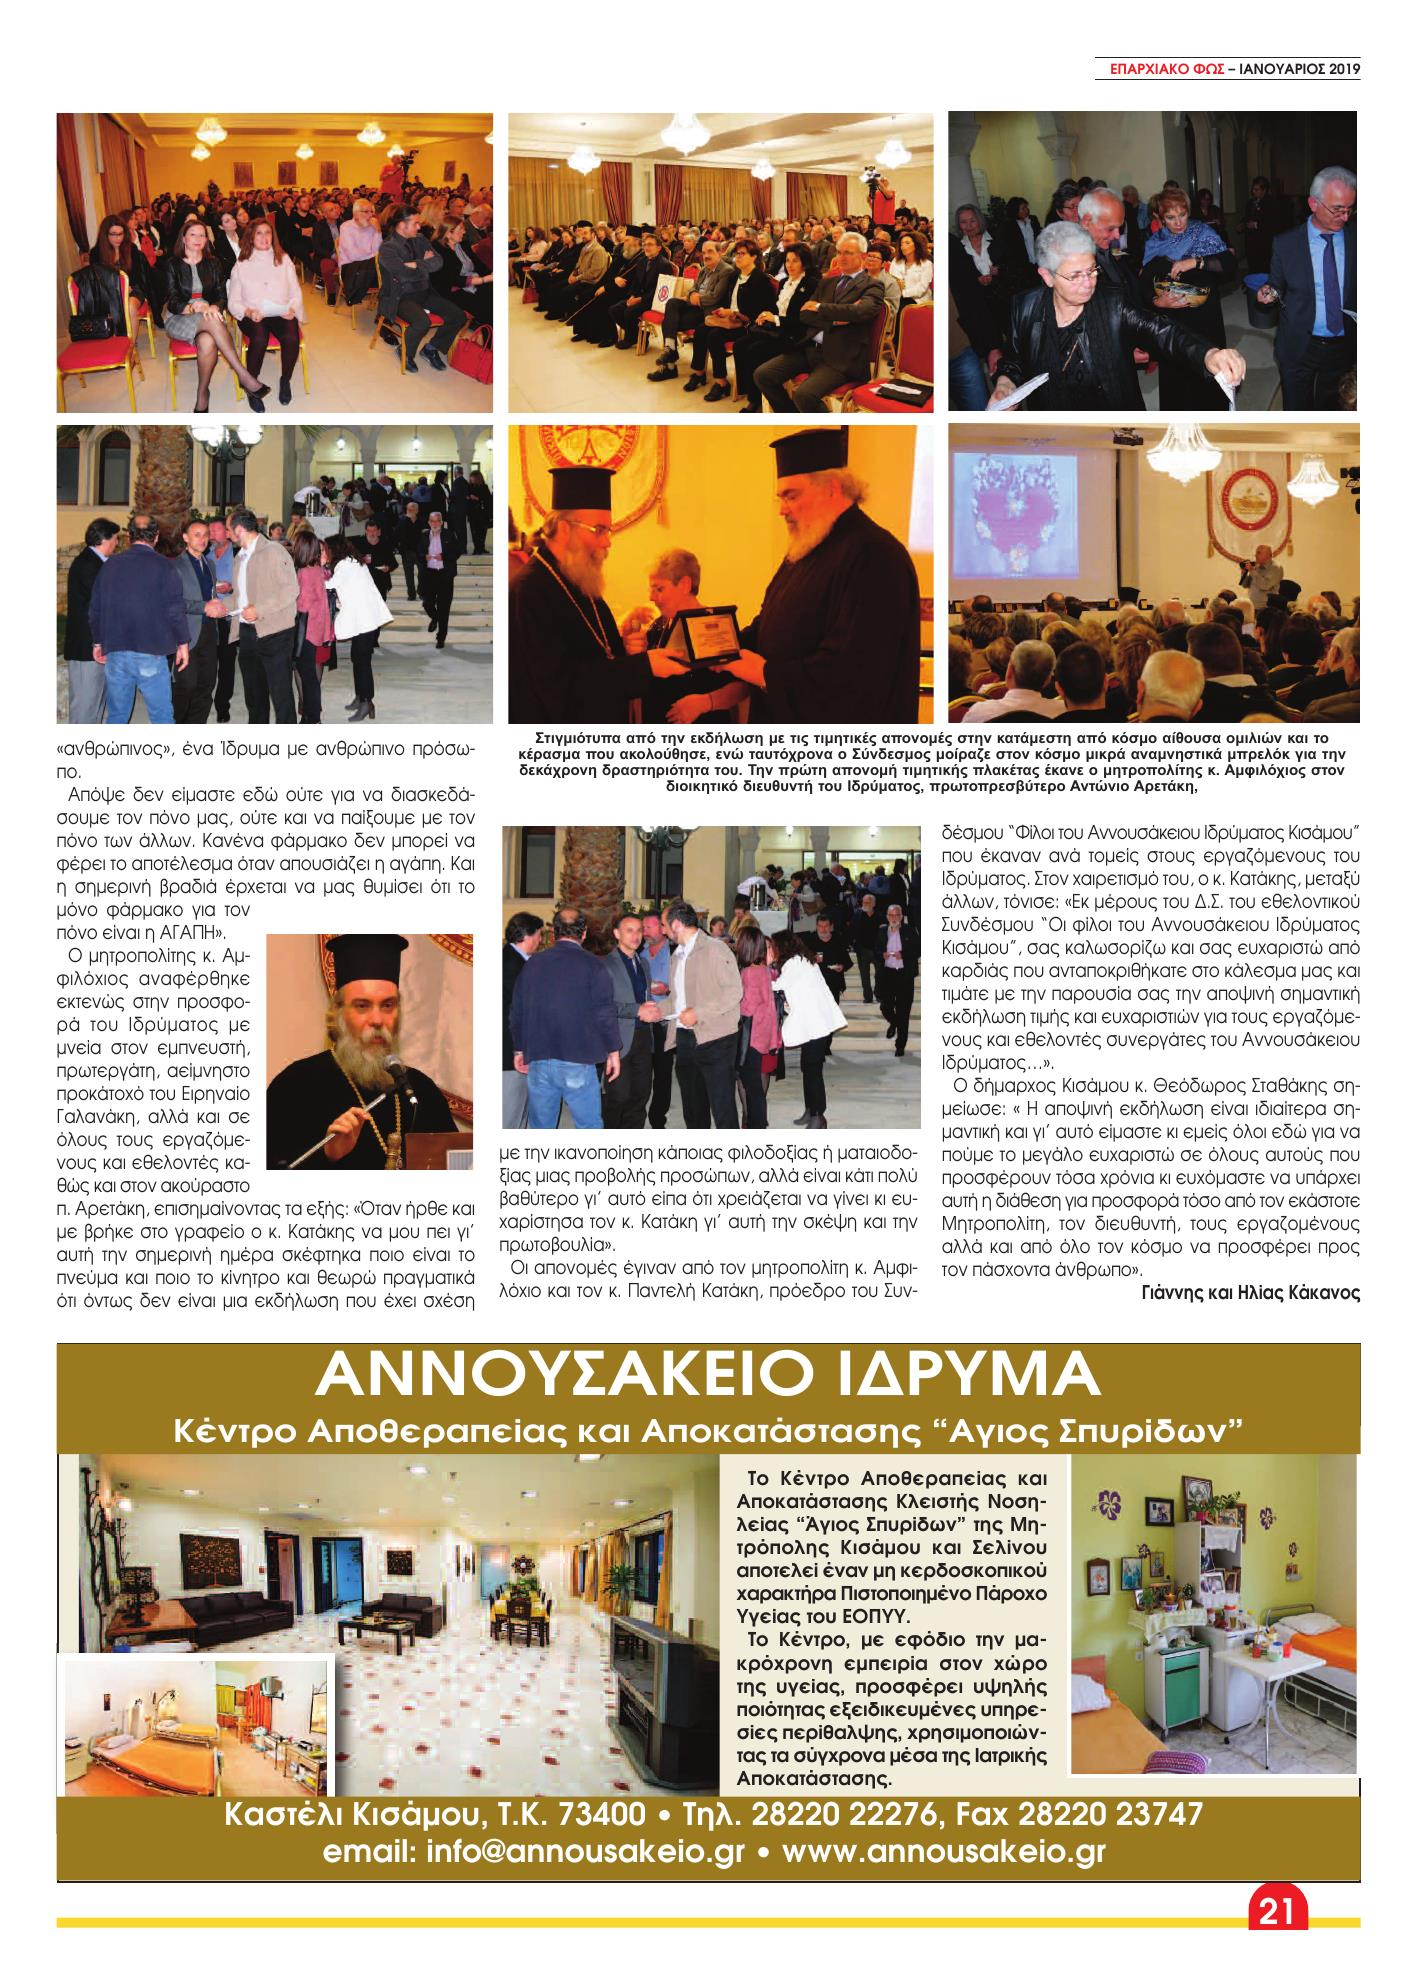 23 KAKANOULHS (Page 21)